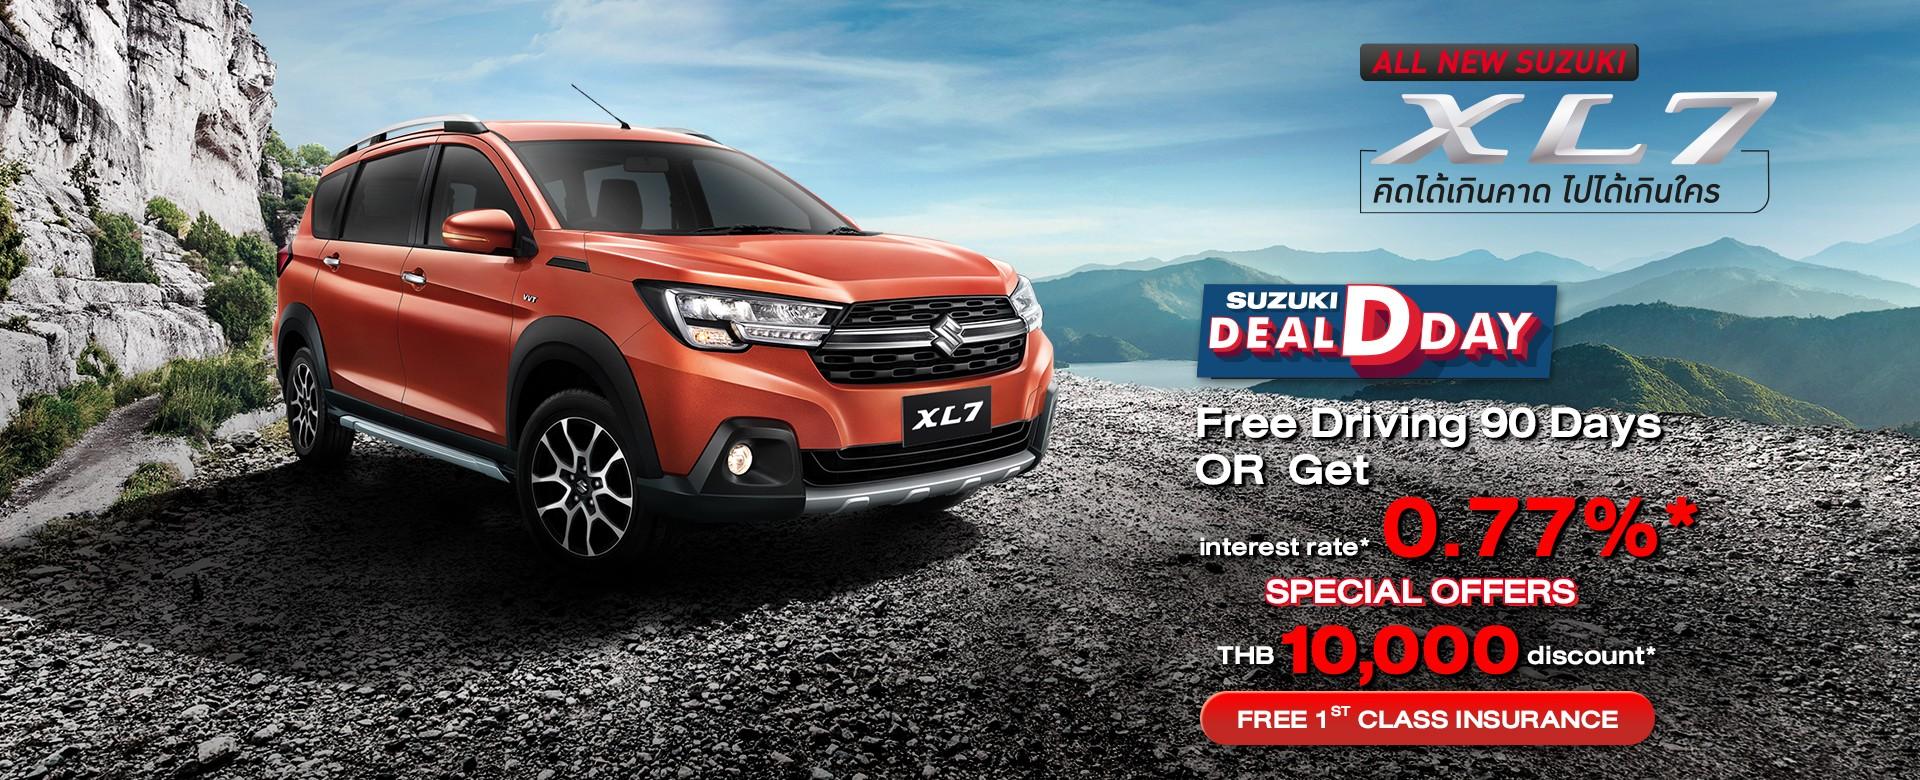 All New Suzuki XL7 Promotion